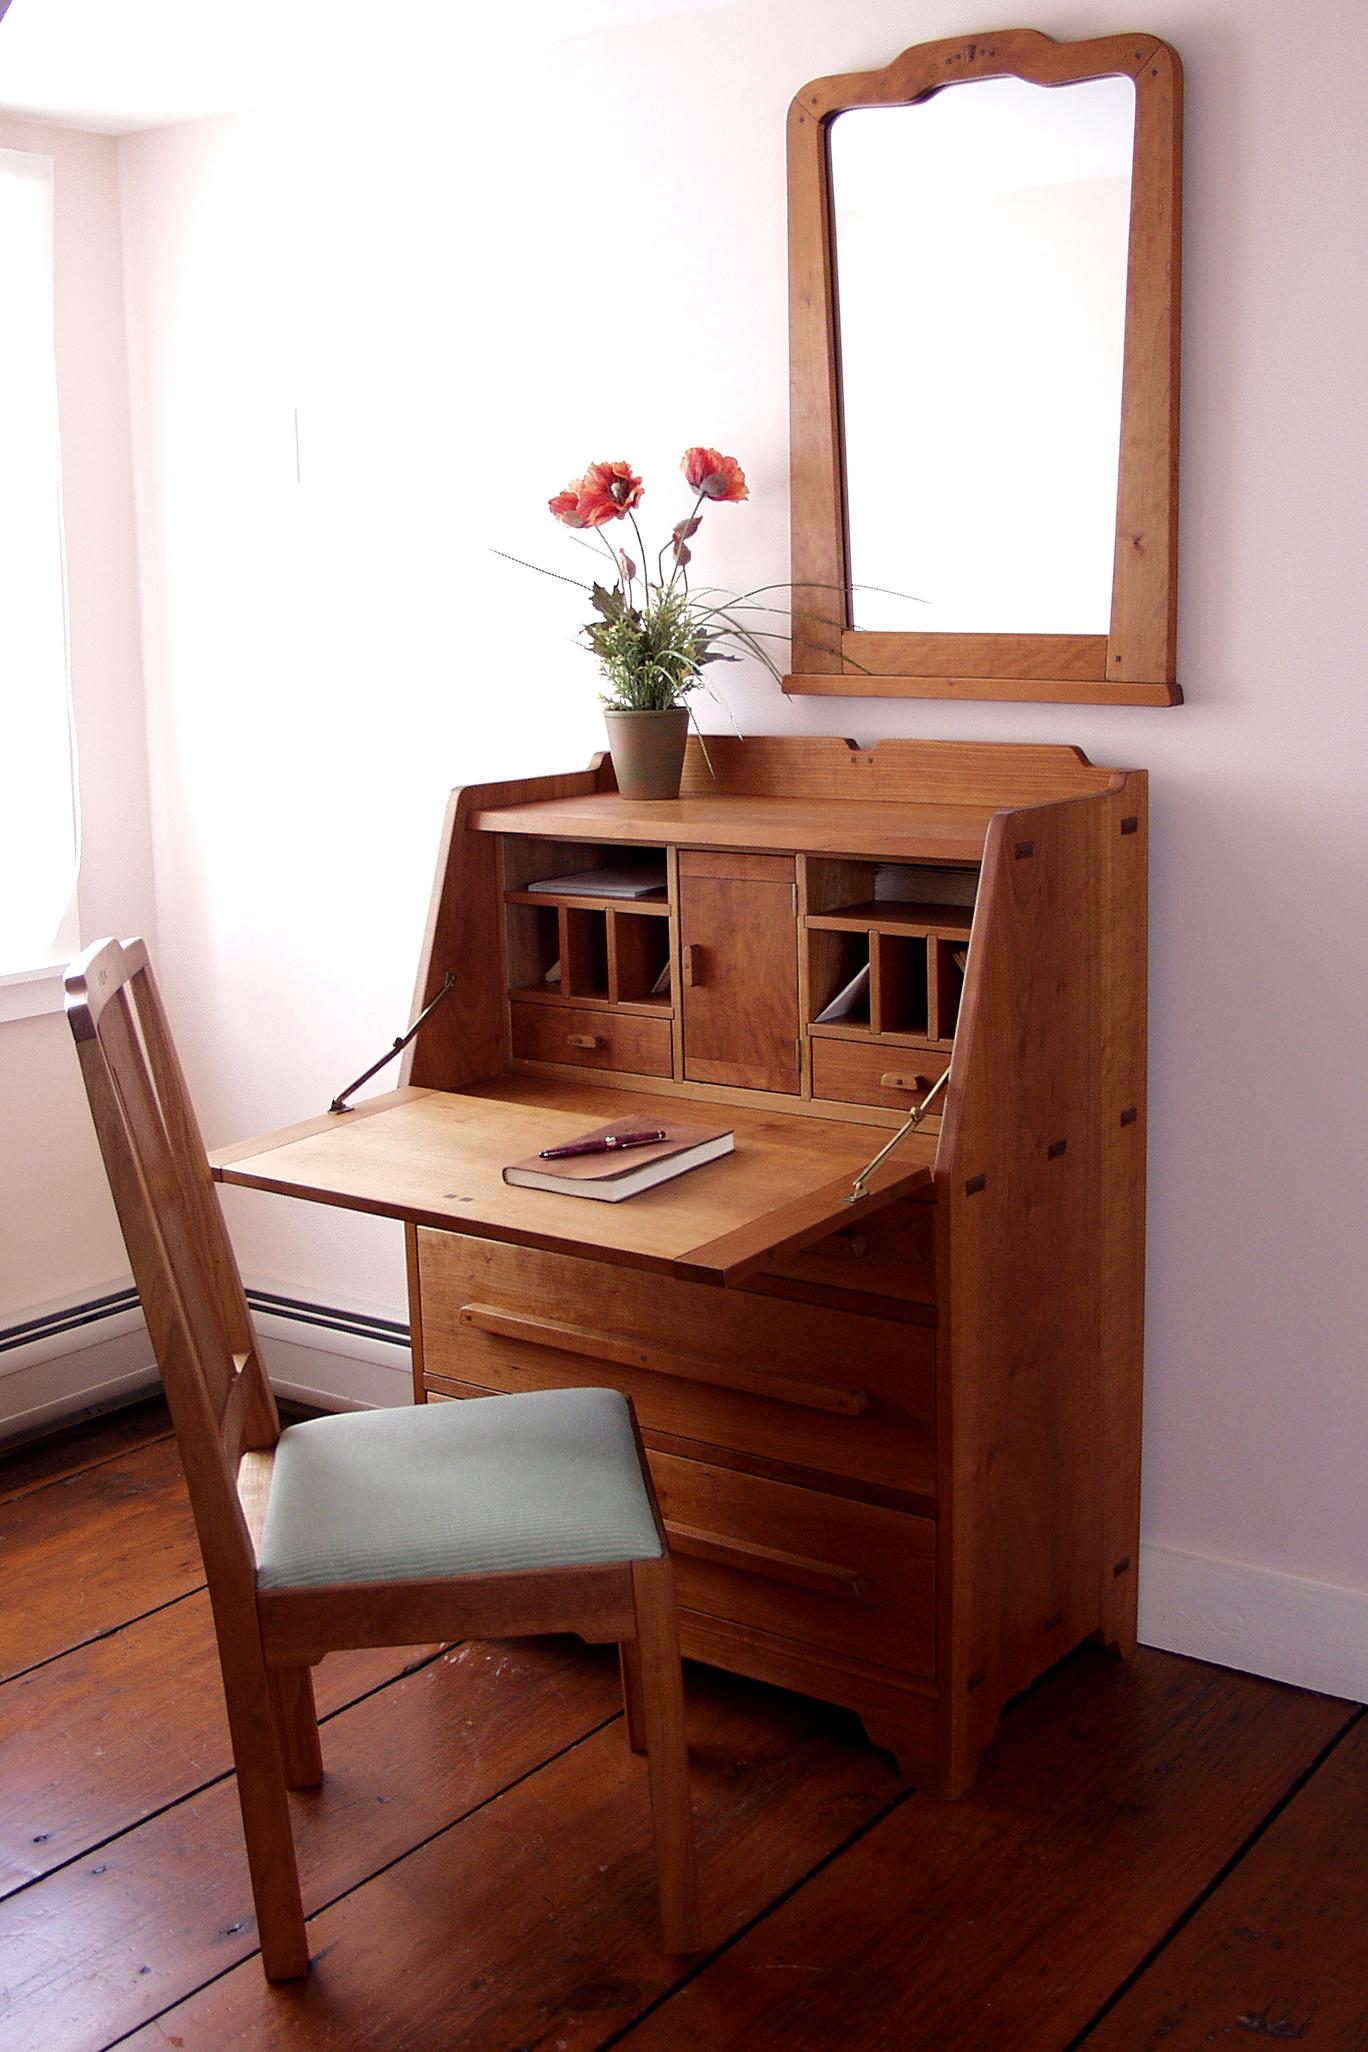 Greene green inspired arts crafts dining table dan for Greene and greene inspired furniture